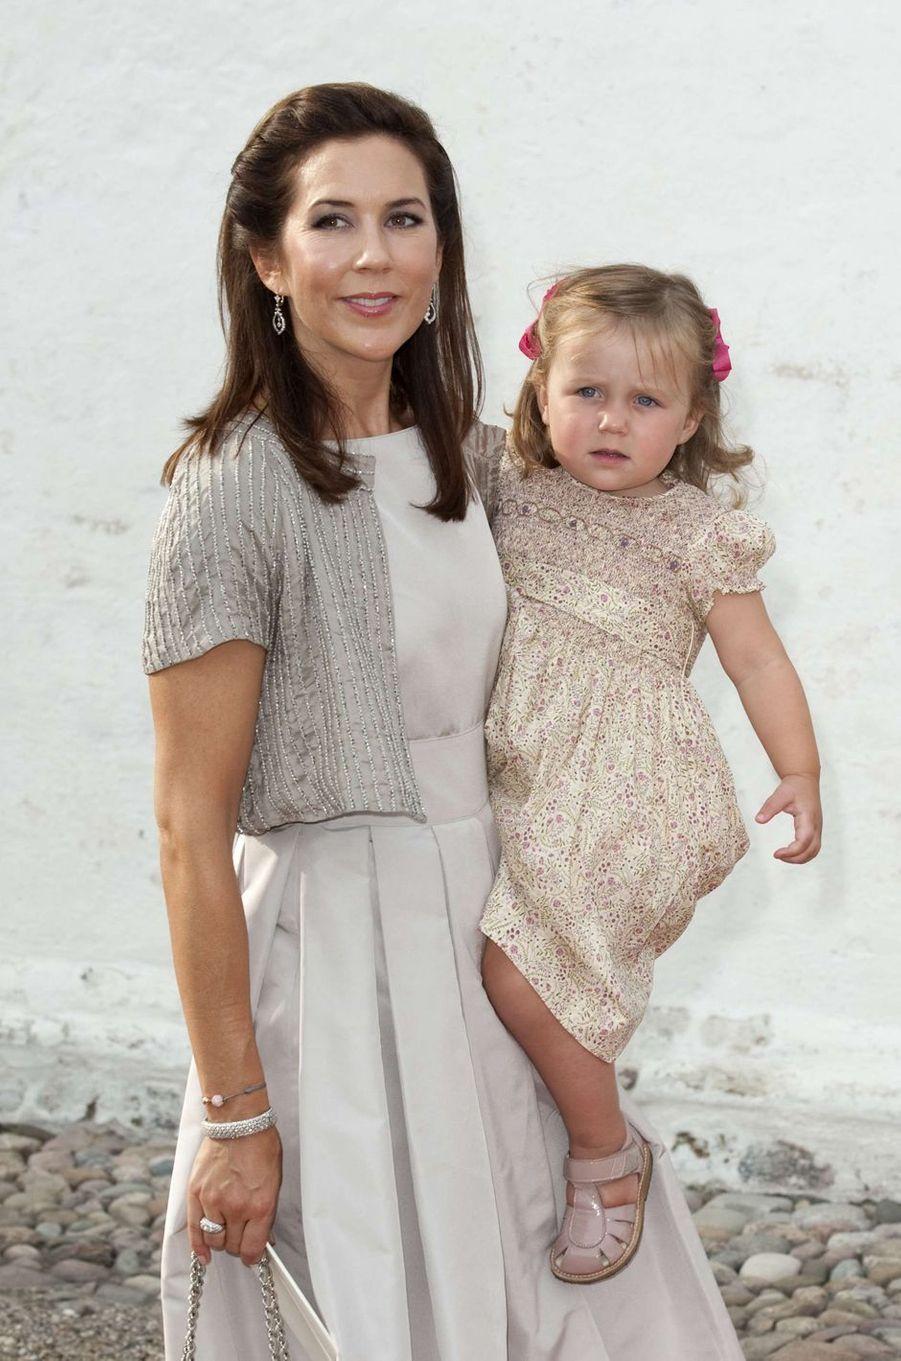 La princesse Isabella de Danemark avec sa mère la princesse Mary, le 26 juillet 2009